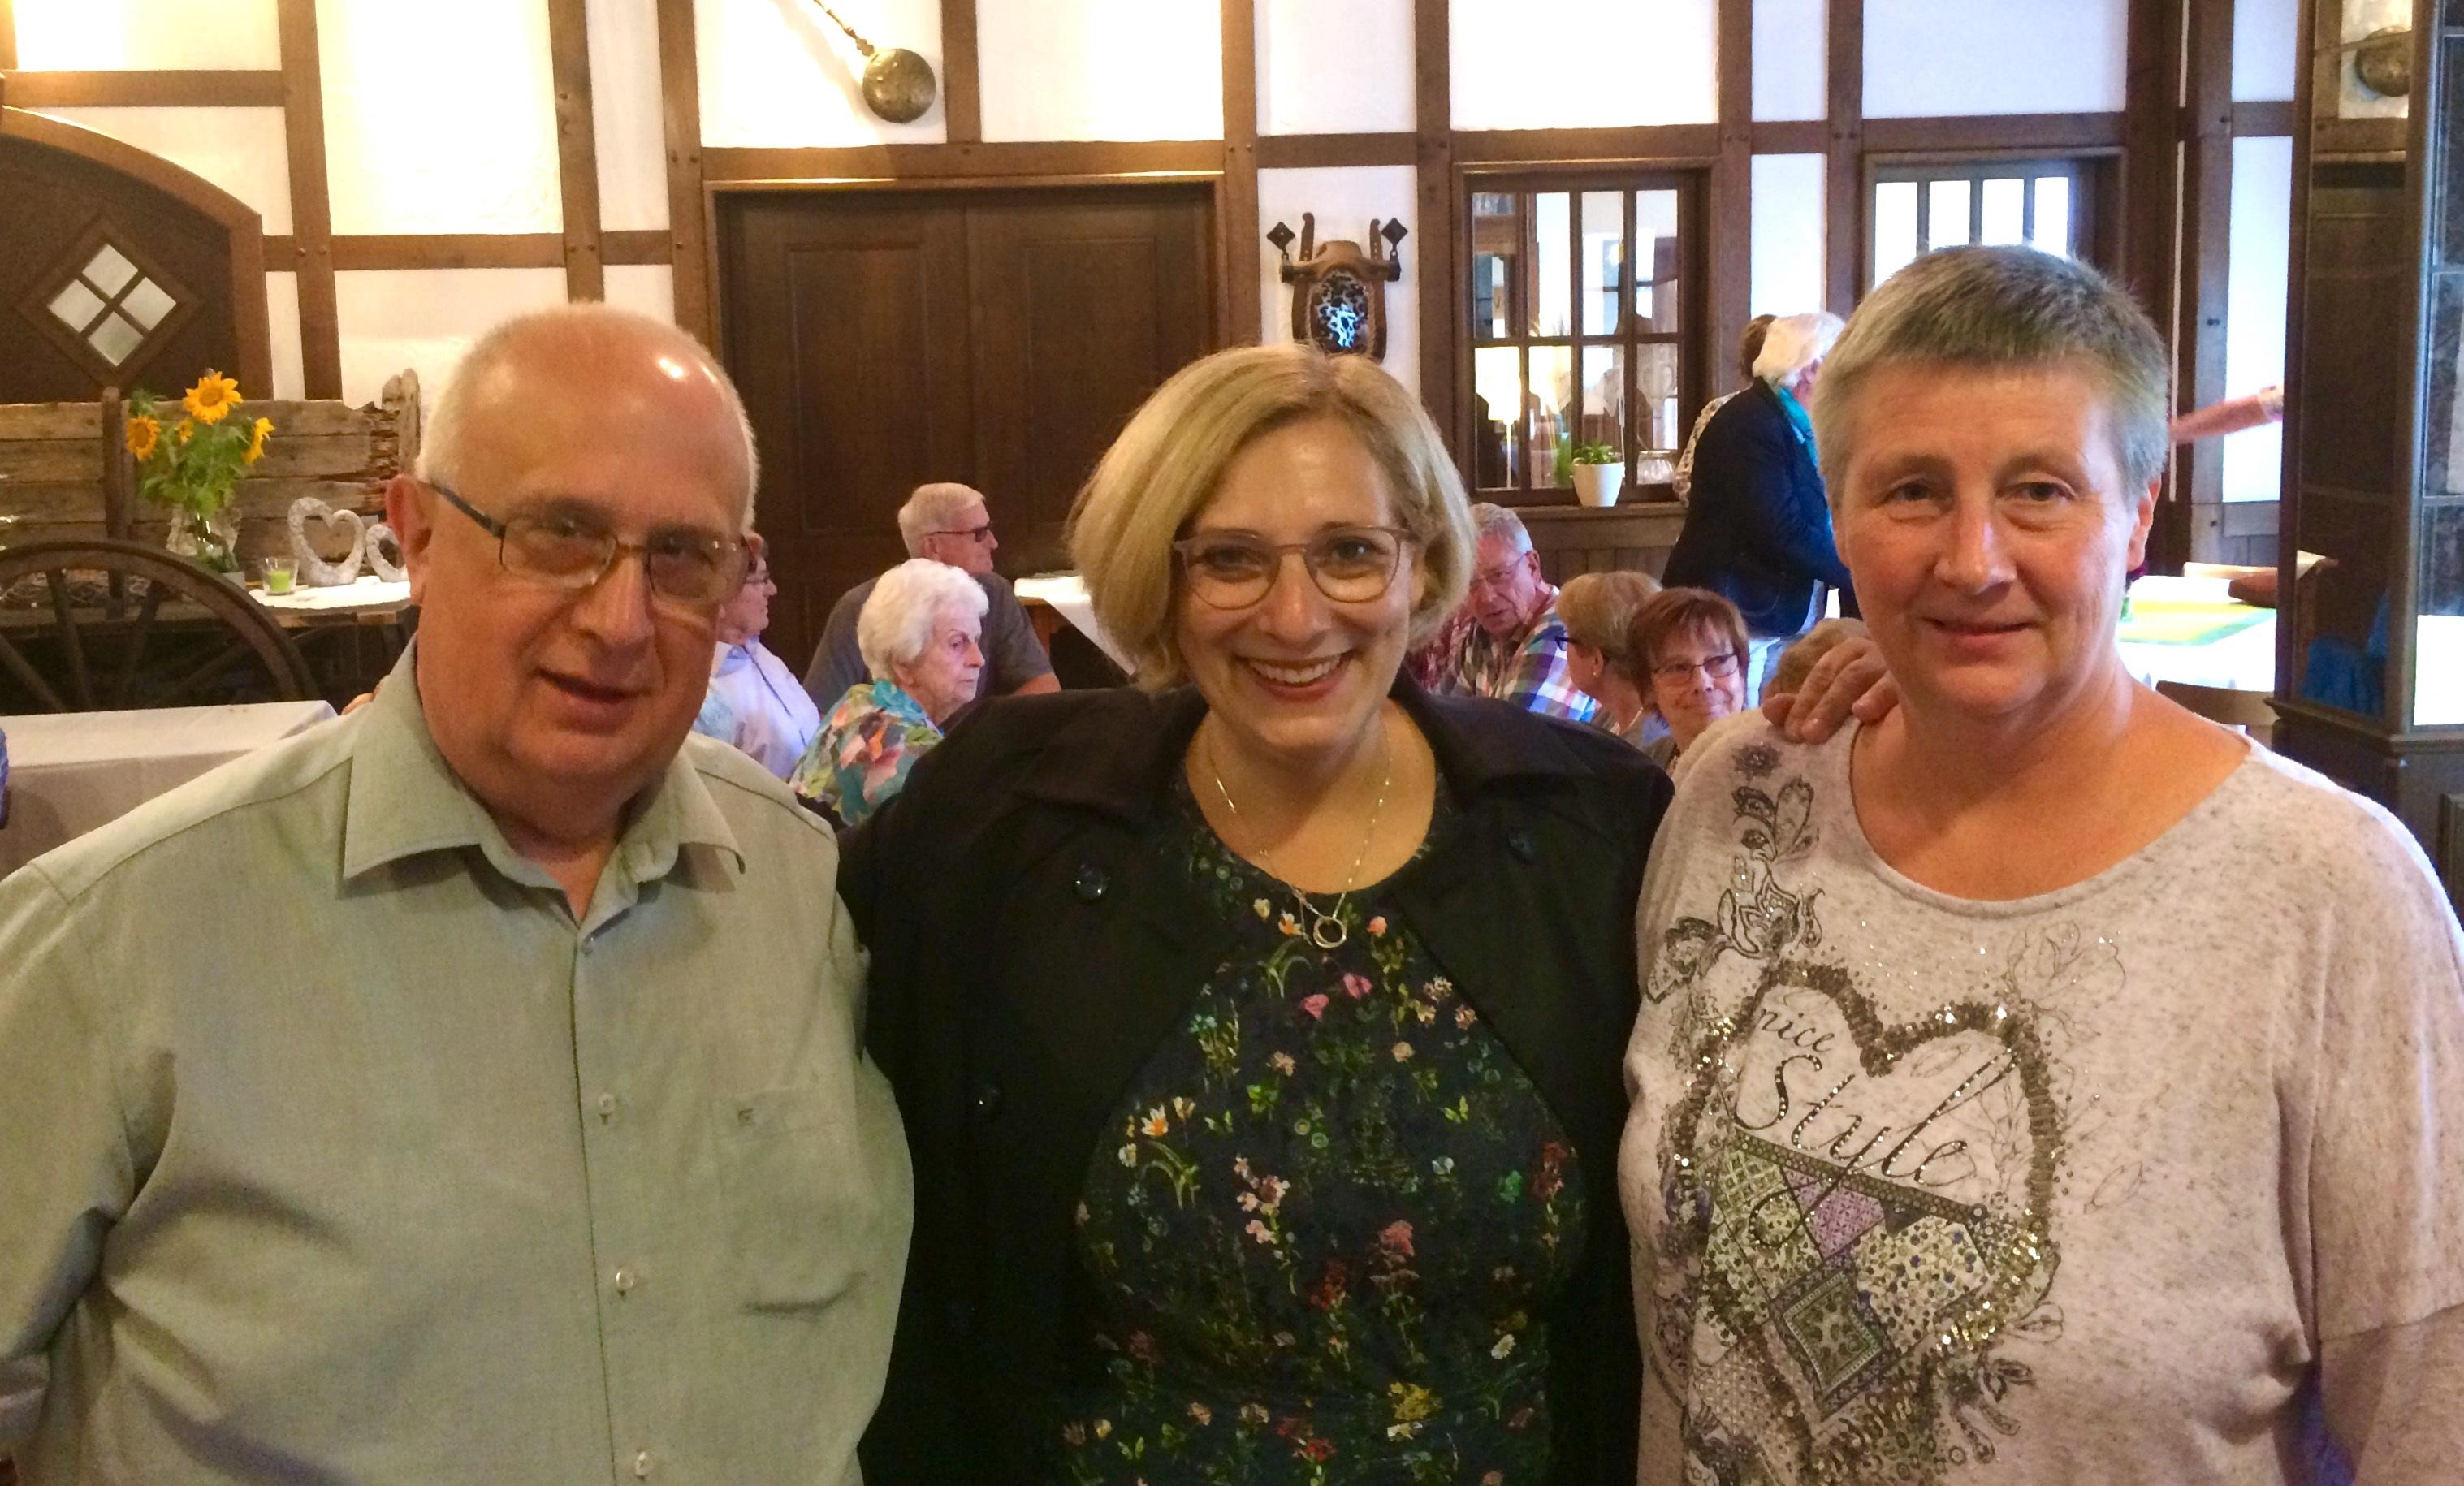 Reinhold Hoffmann, Dr. Daniela De Ridder und Ulla Ahrend